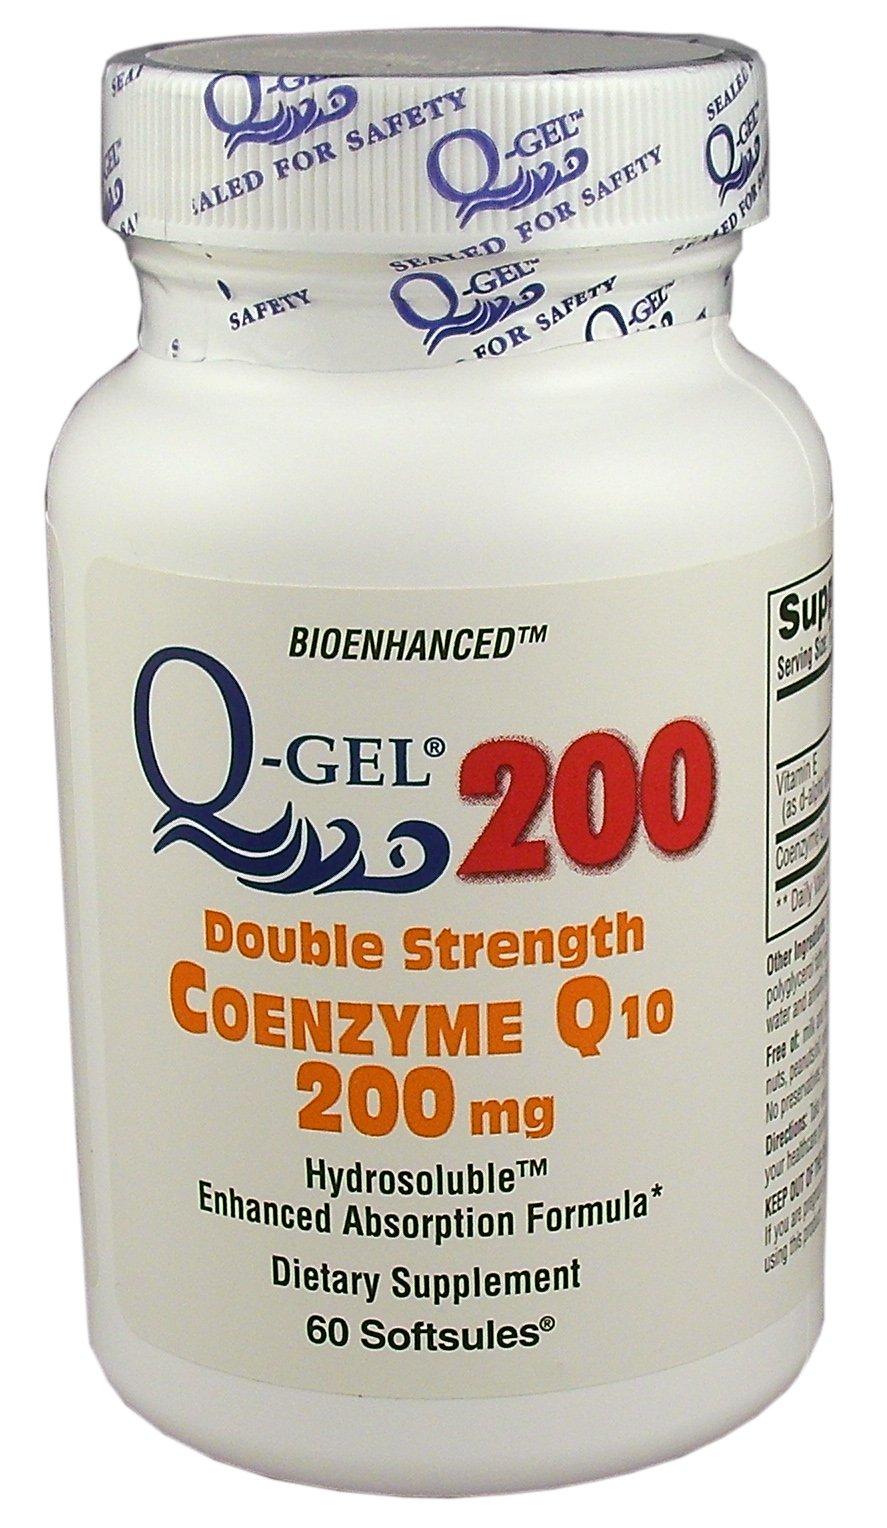 Q-Gel 200mg Double Strength Hydrosoluble CoQ10 (180 Softgels)